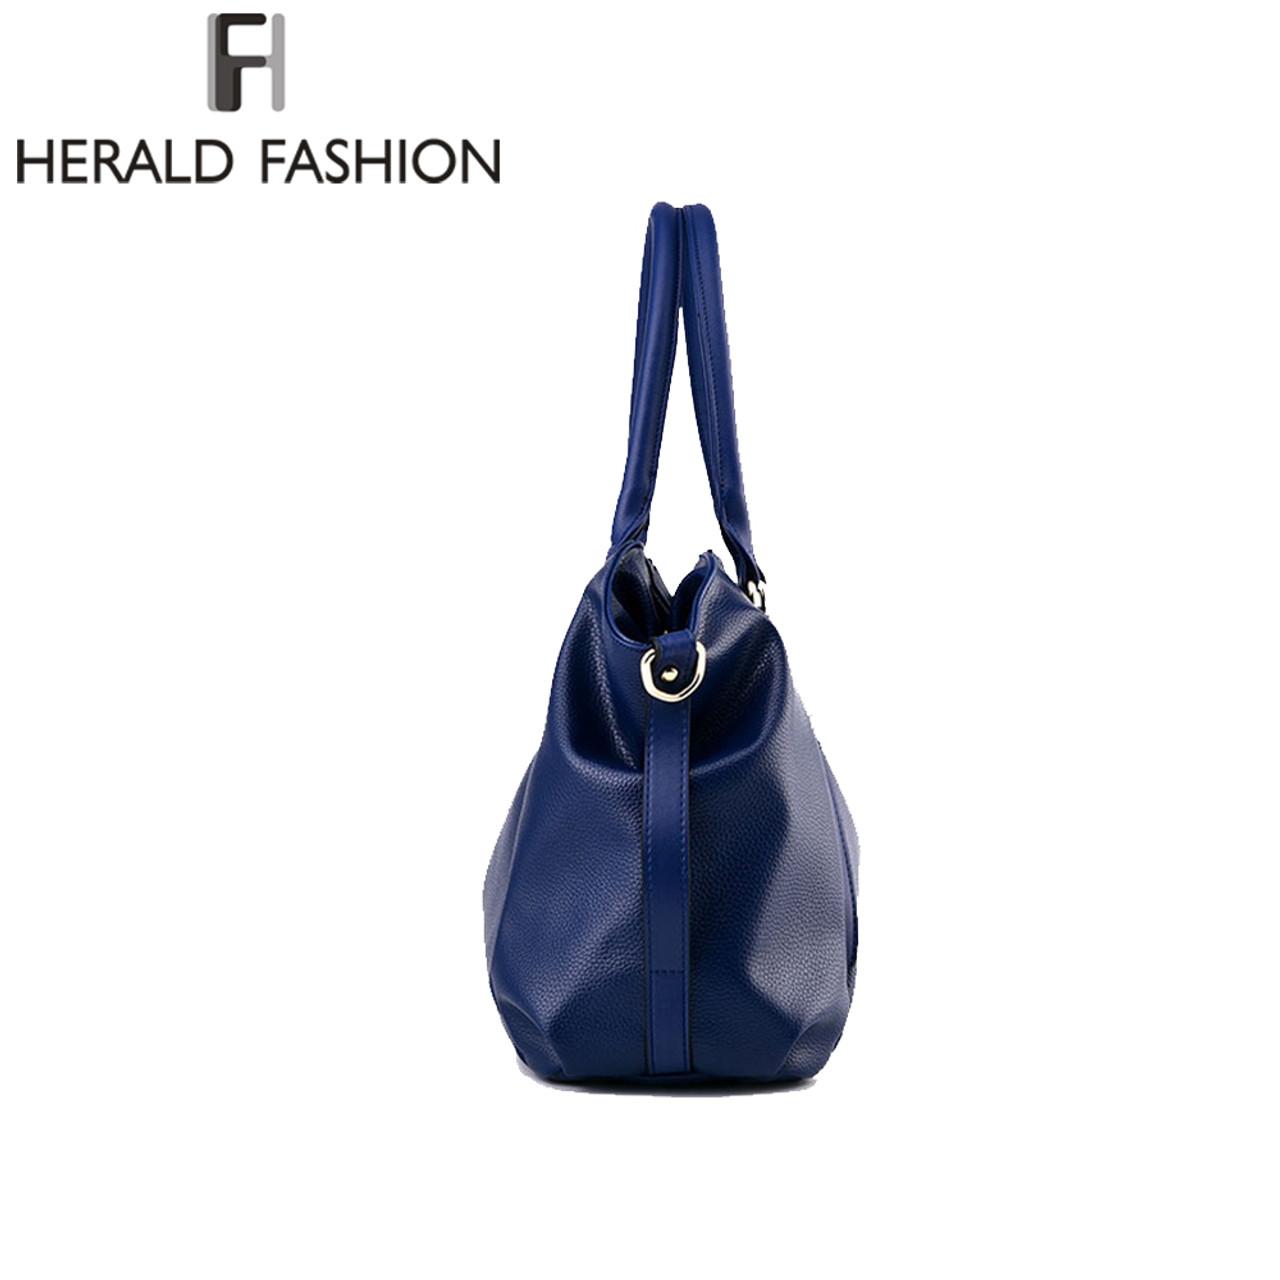 e844f9b1ce8 ... Herald Fashion Designer Women Handbag Female PU Leather Bags Handbags  Ladies Portable Shoulder Bag Office Ladies ...